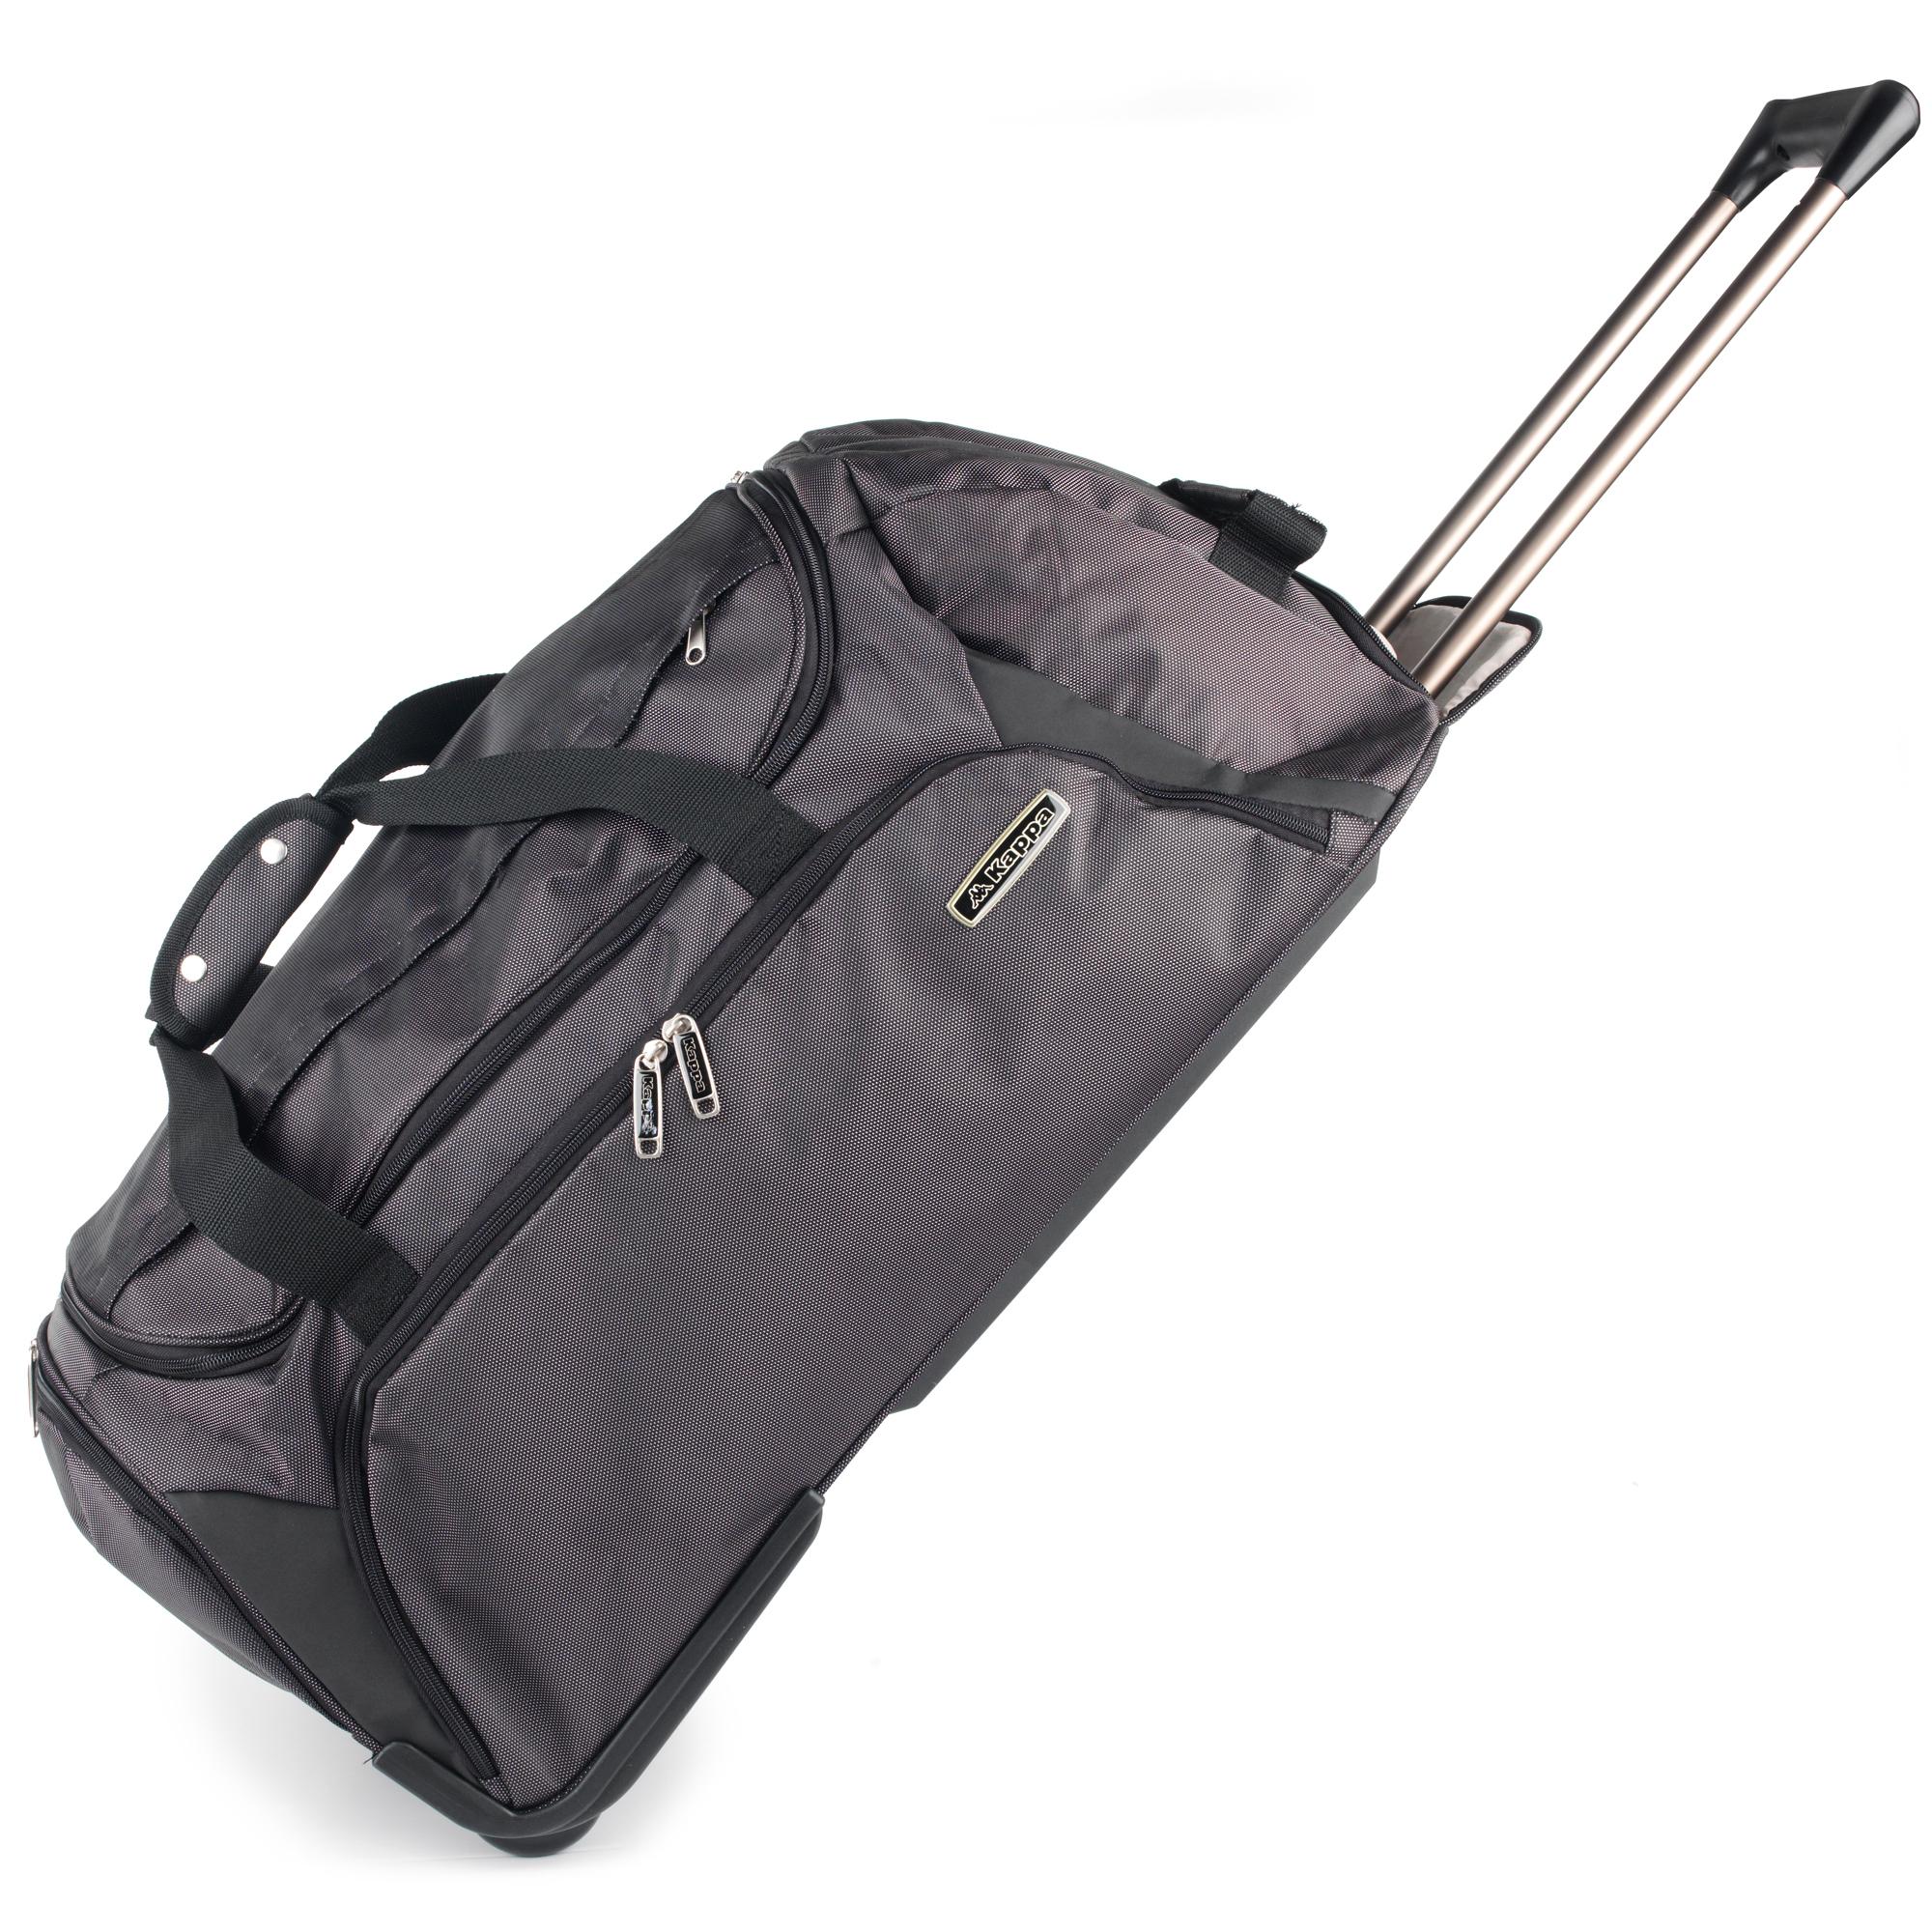 58f9bf8e87f6 Wheeled Sports Bag Uk